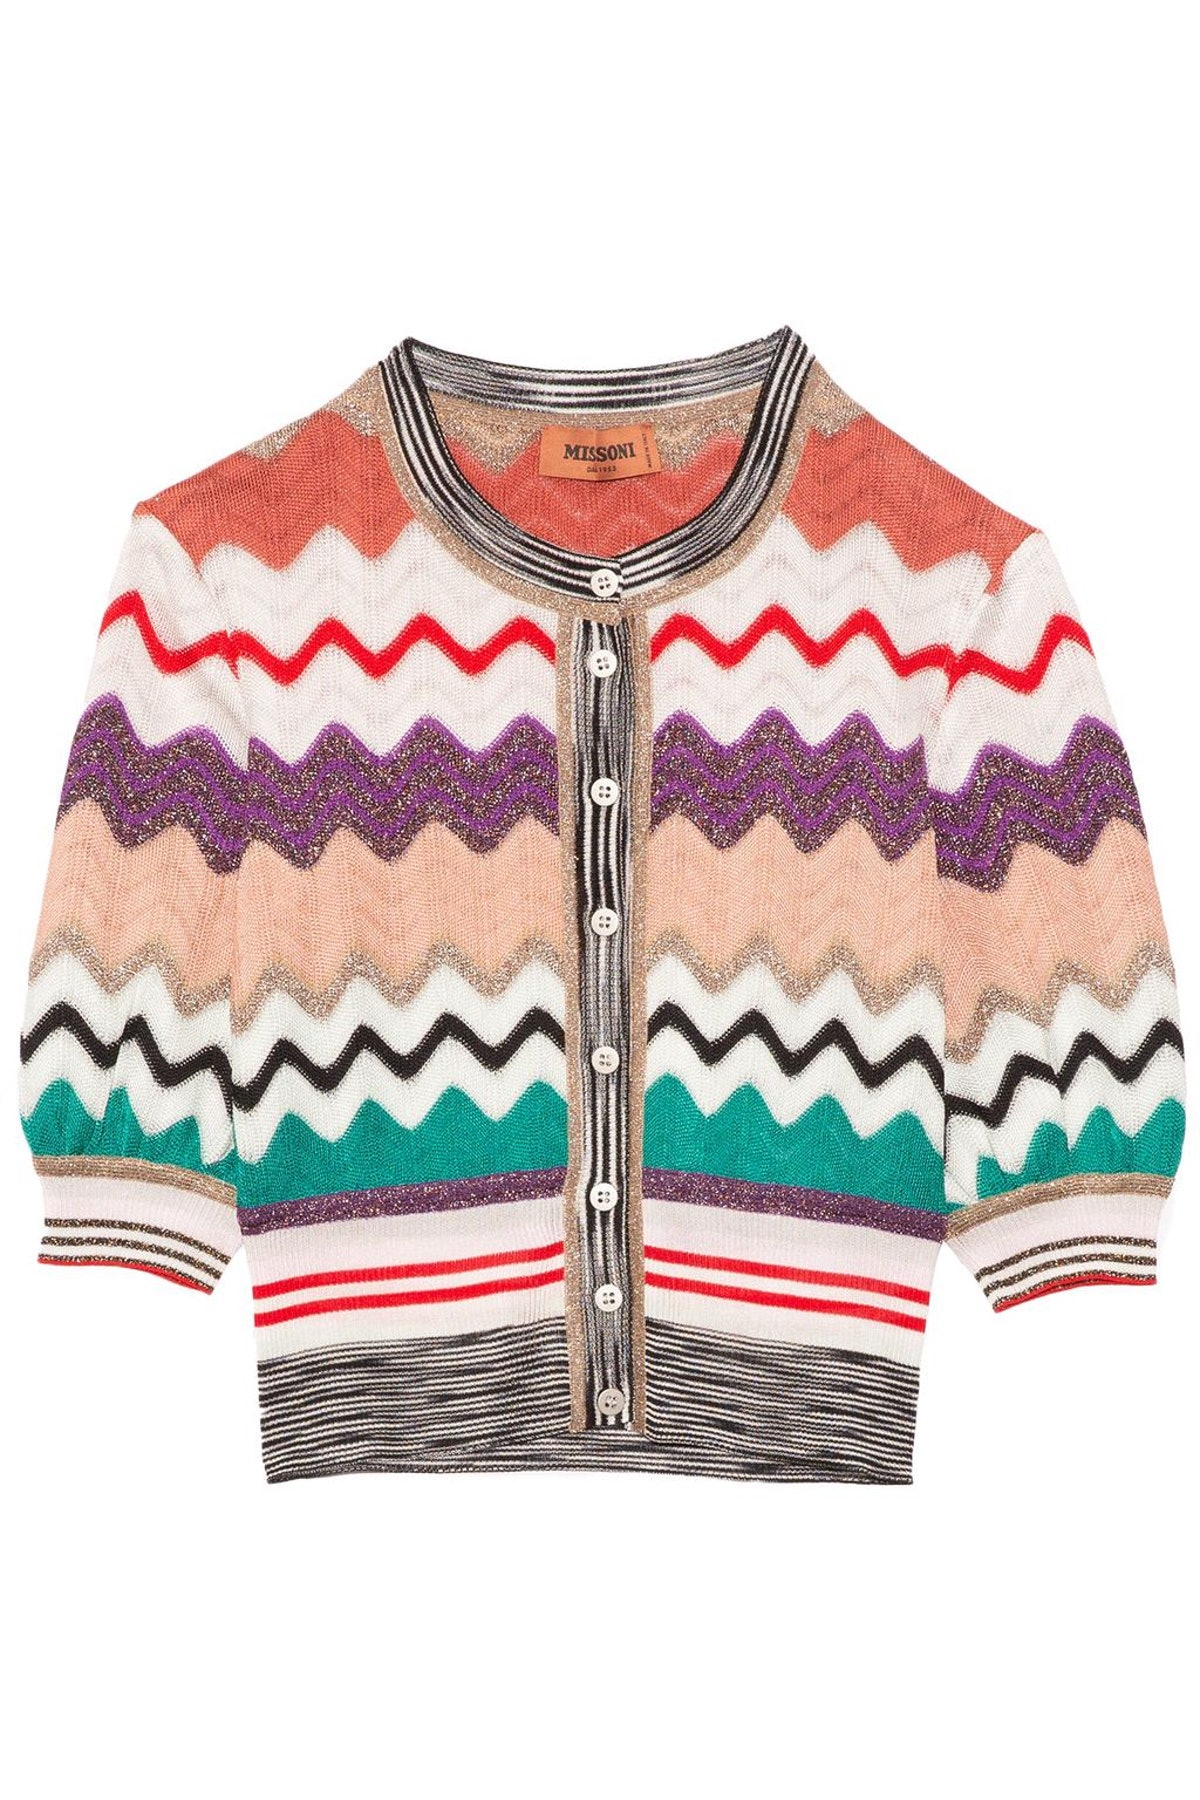 Short Knit Cardigan in Multi: image 1